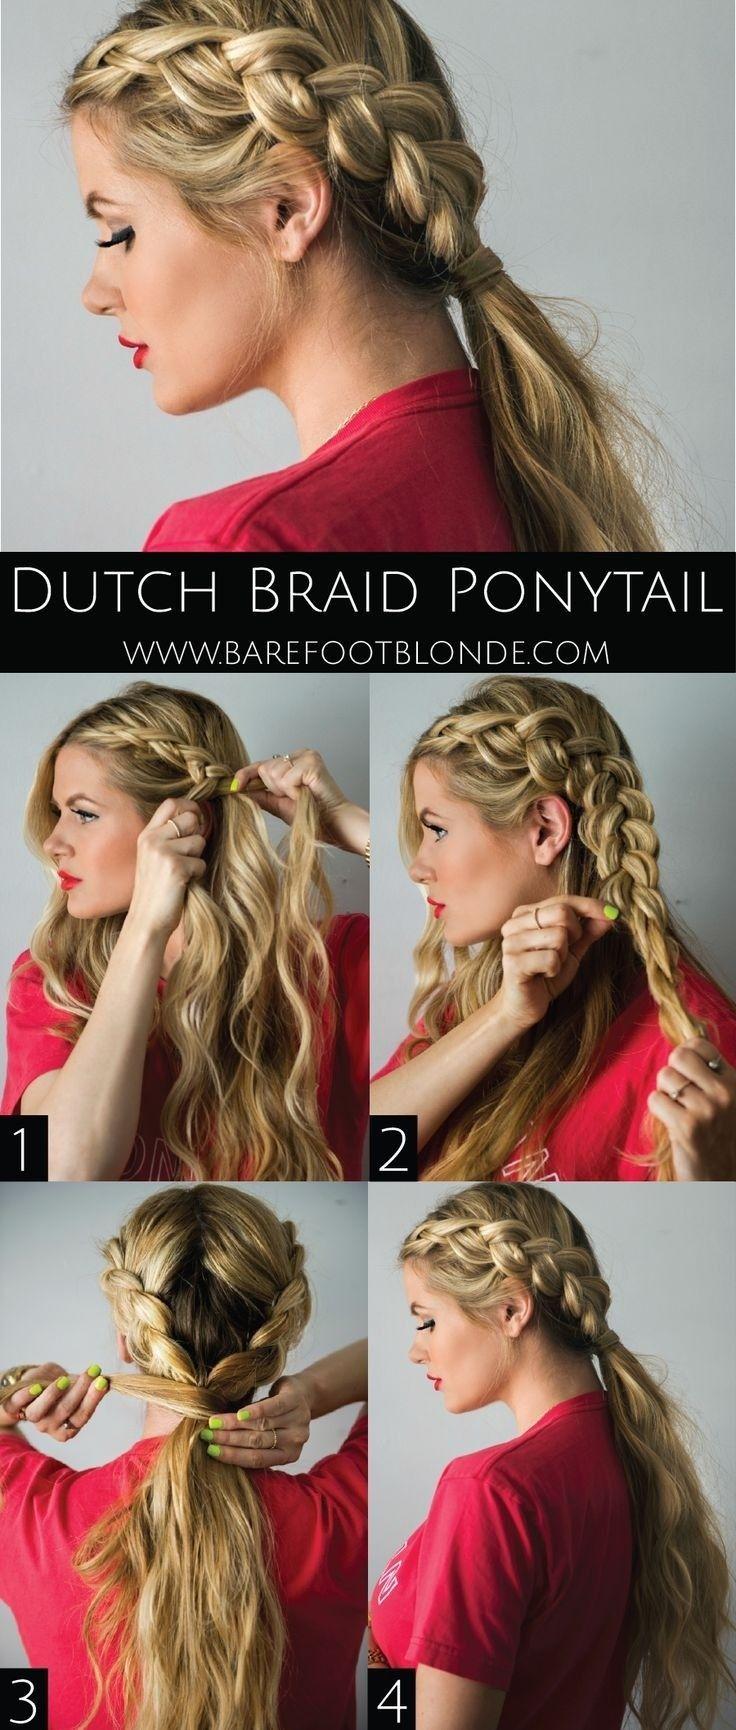 Dutch Braid Ponytail: Loose Braided Hairstyle Tutorial for Long Hair: